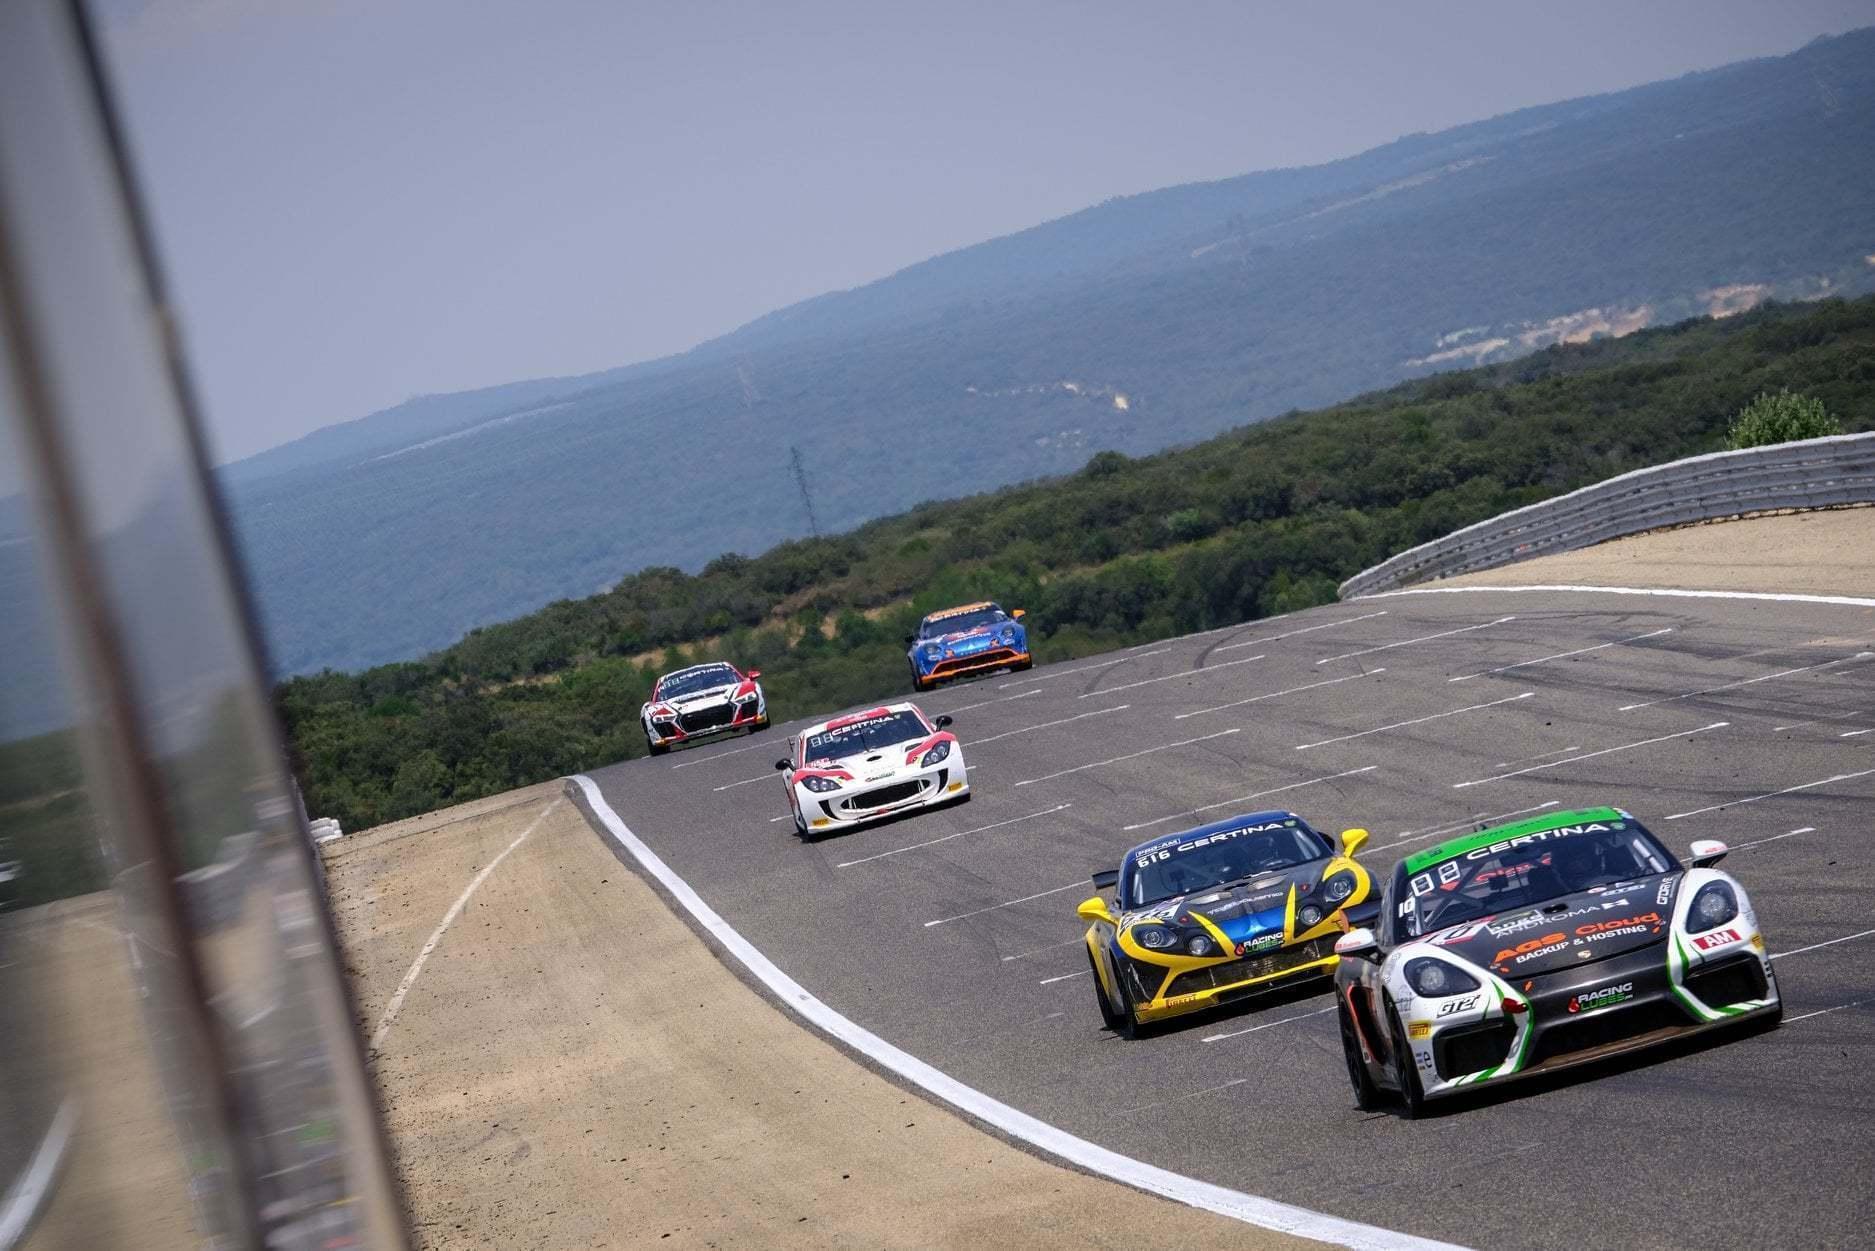 FFSA GT: CMR reprend la main Lédenon ! (Course 2) 17